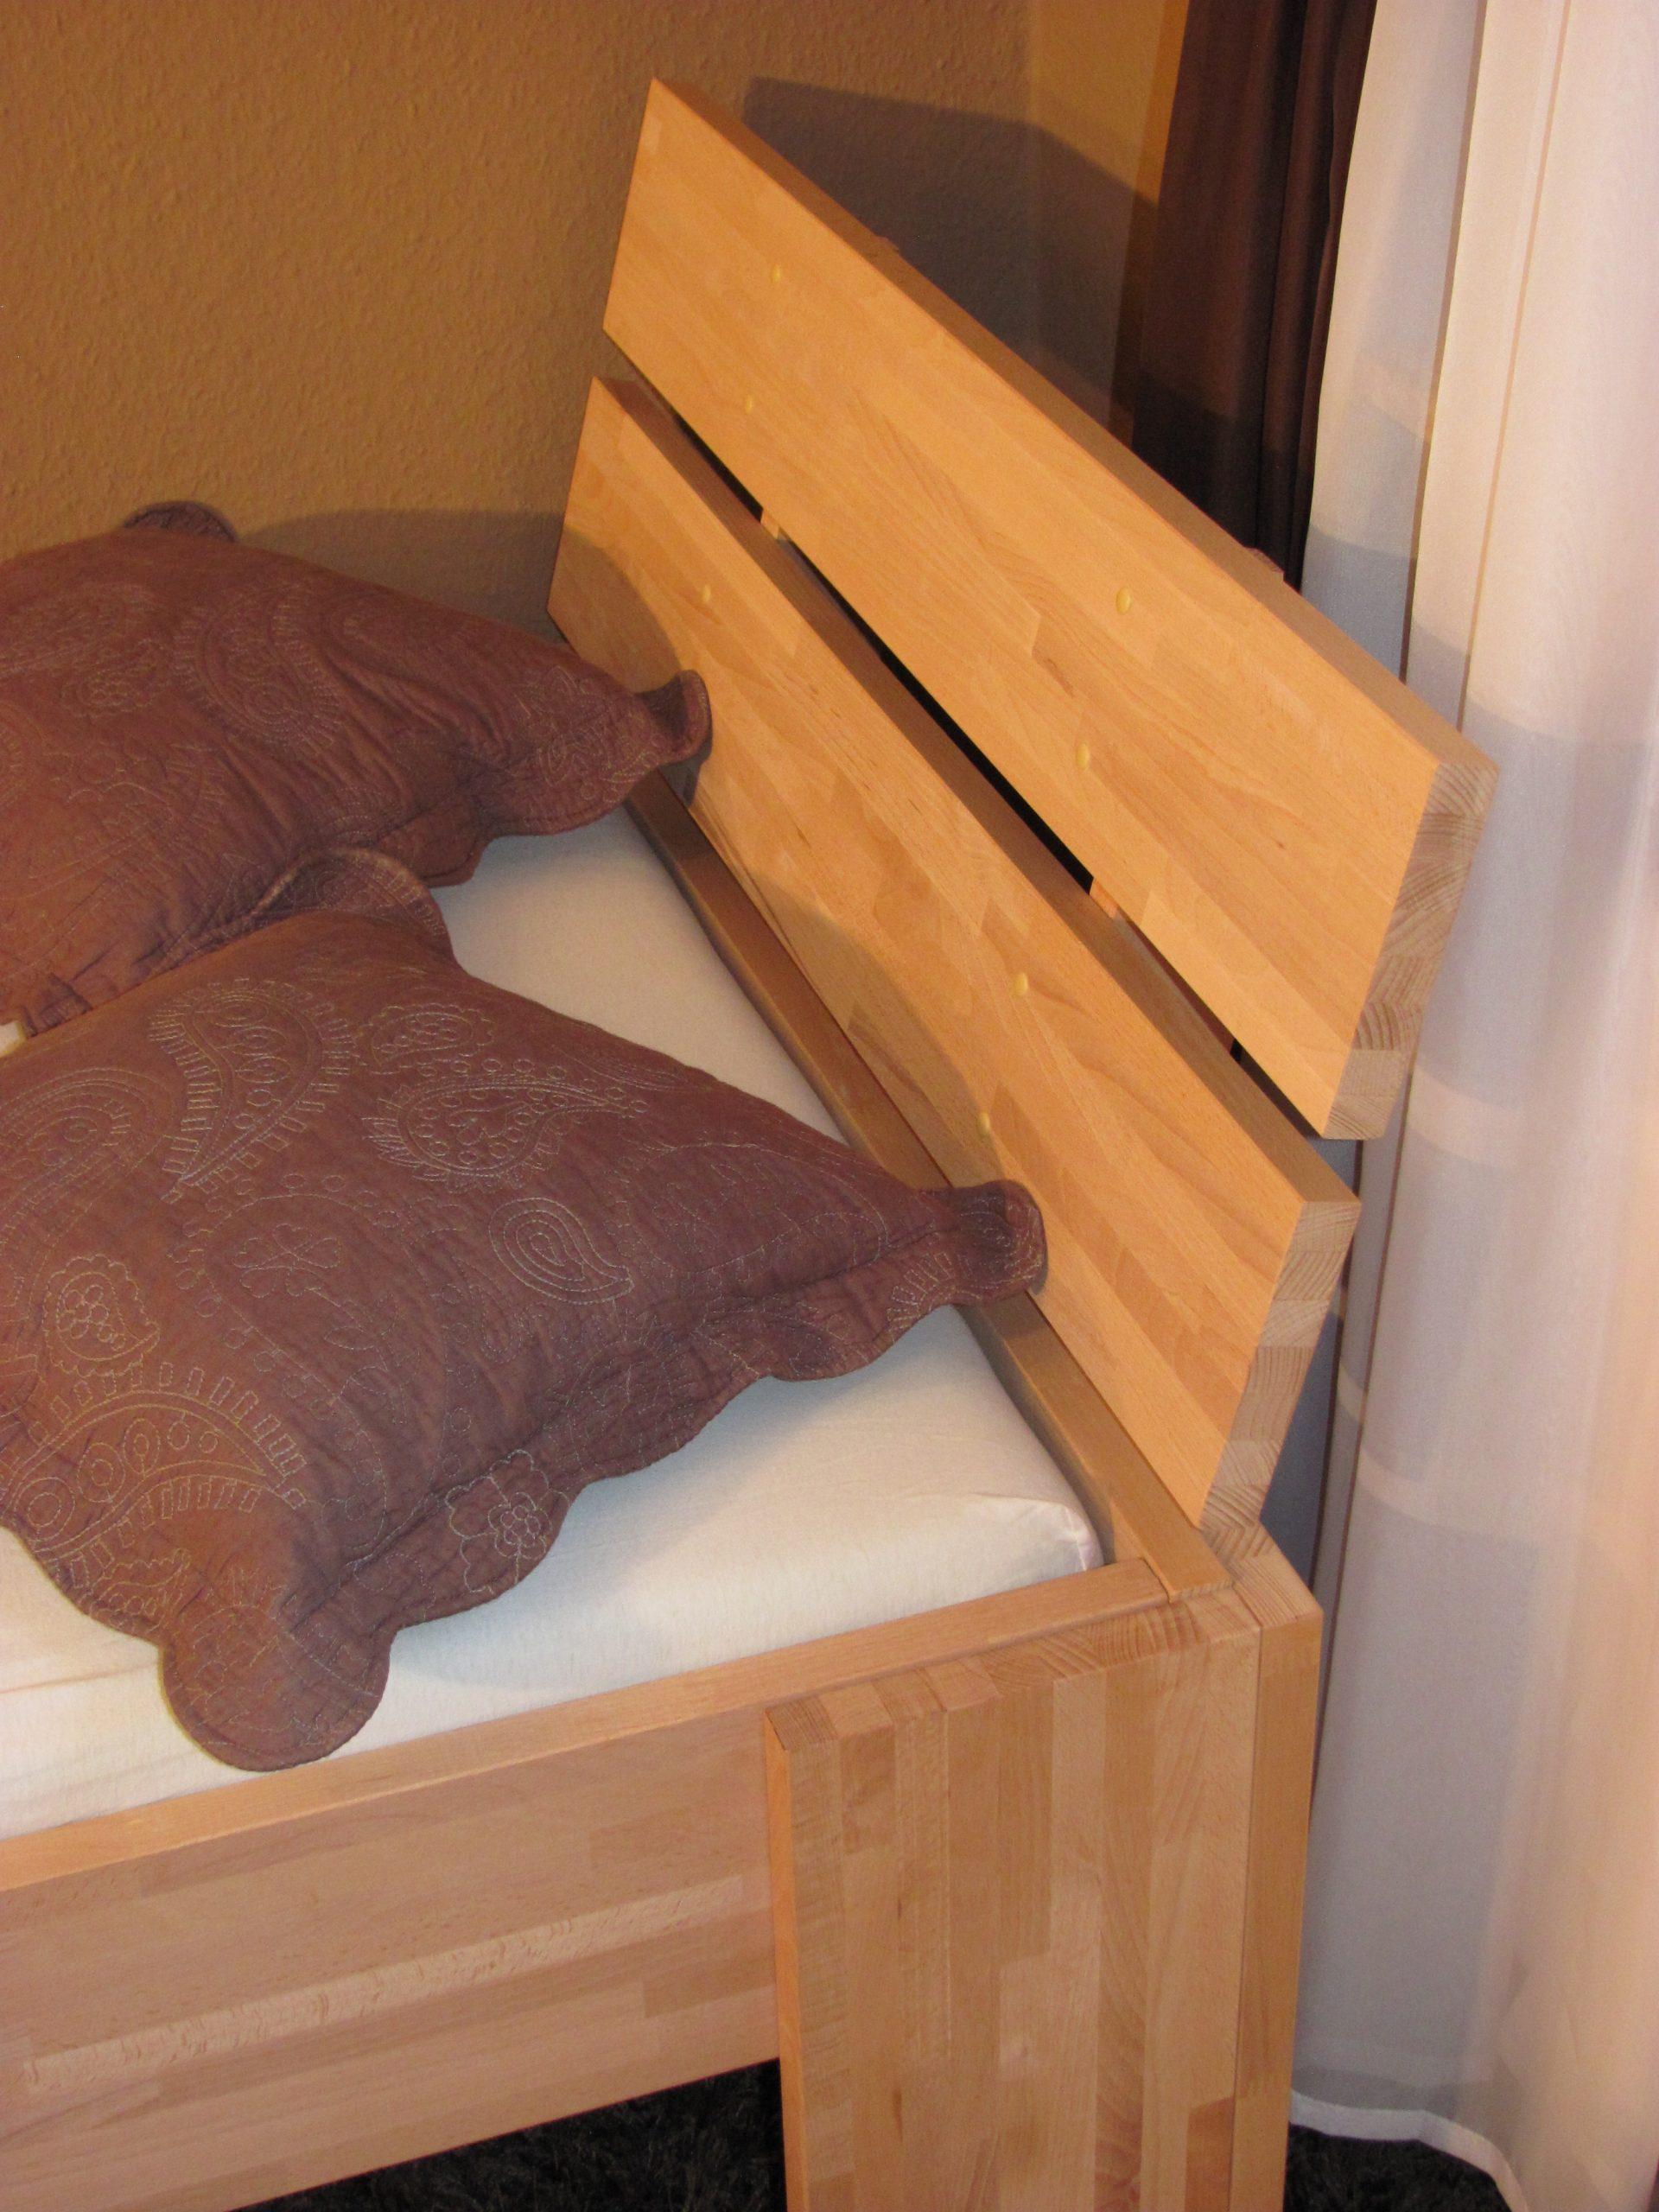 Full Size of Massivholz Bett 27mm Massivholzbett Einzelbett Doppelbett Mit Fuss I Betten 140x200 Metall Ausgefallene Inkontinenzeinlagen 180x200 Lattenrost Und Matratze Bett Massivholz Bett